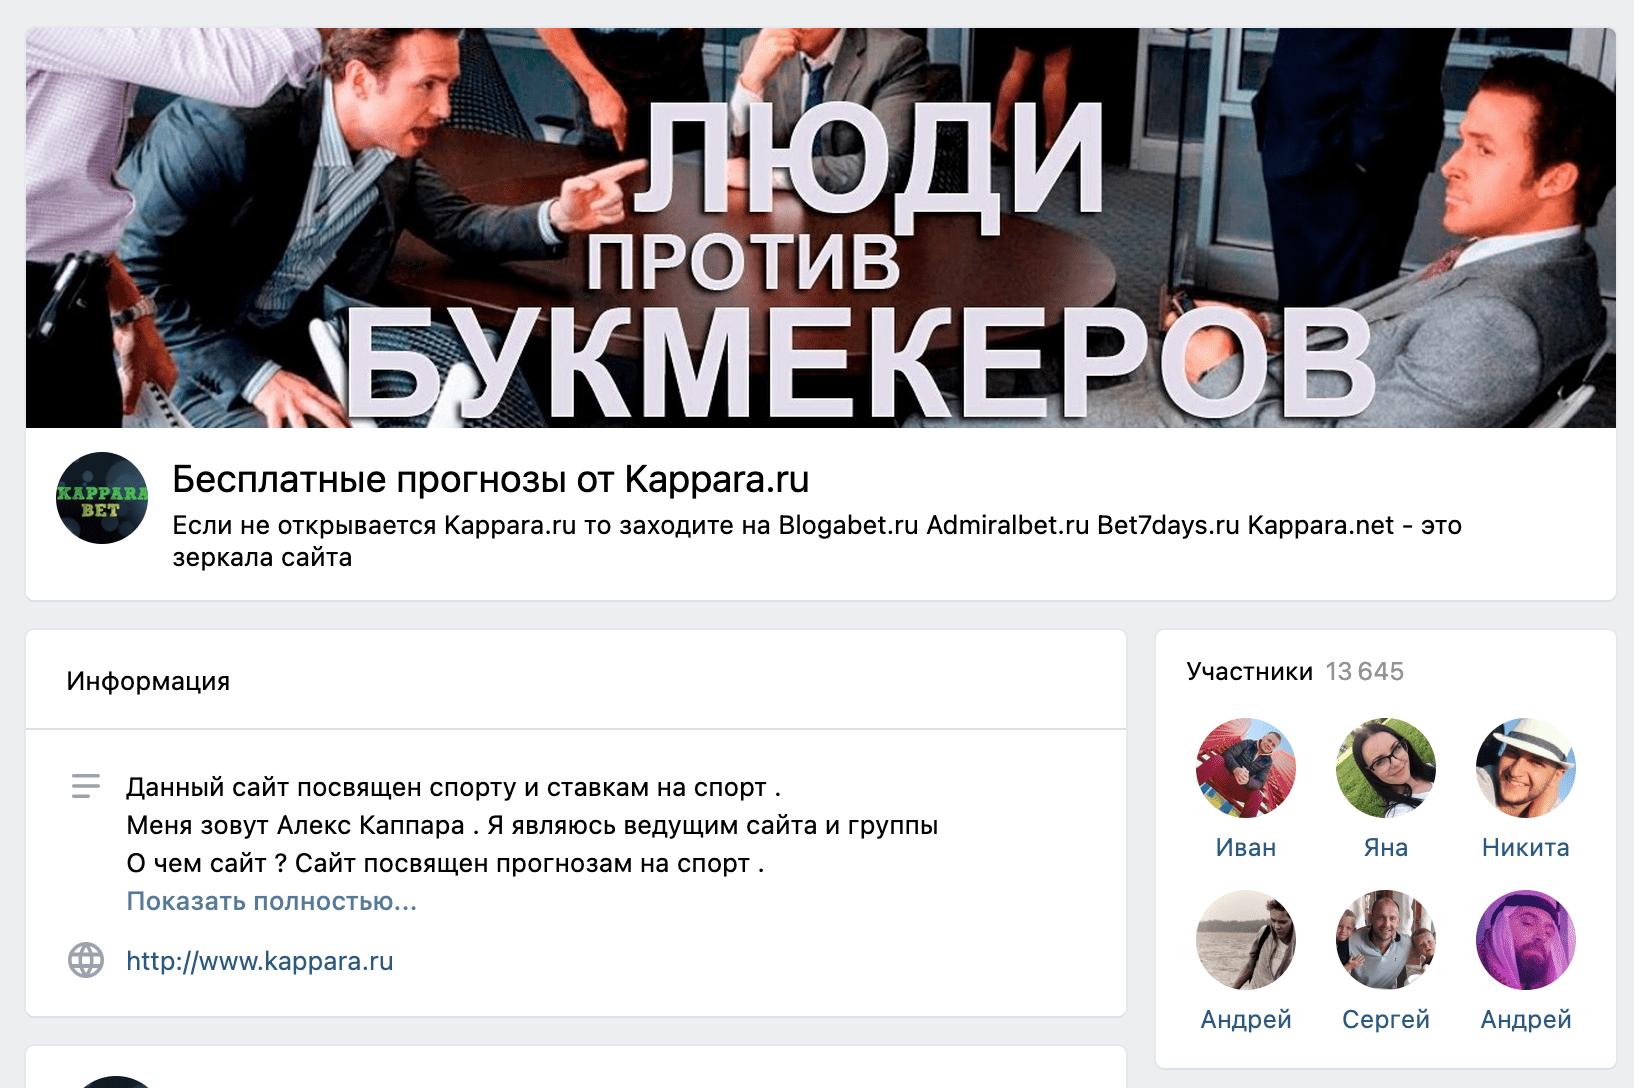 Группа ВК Kappara ru(Каппара.ру)